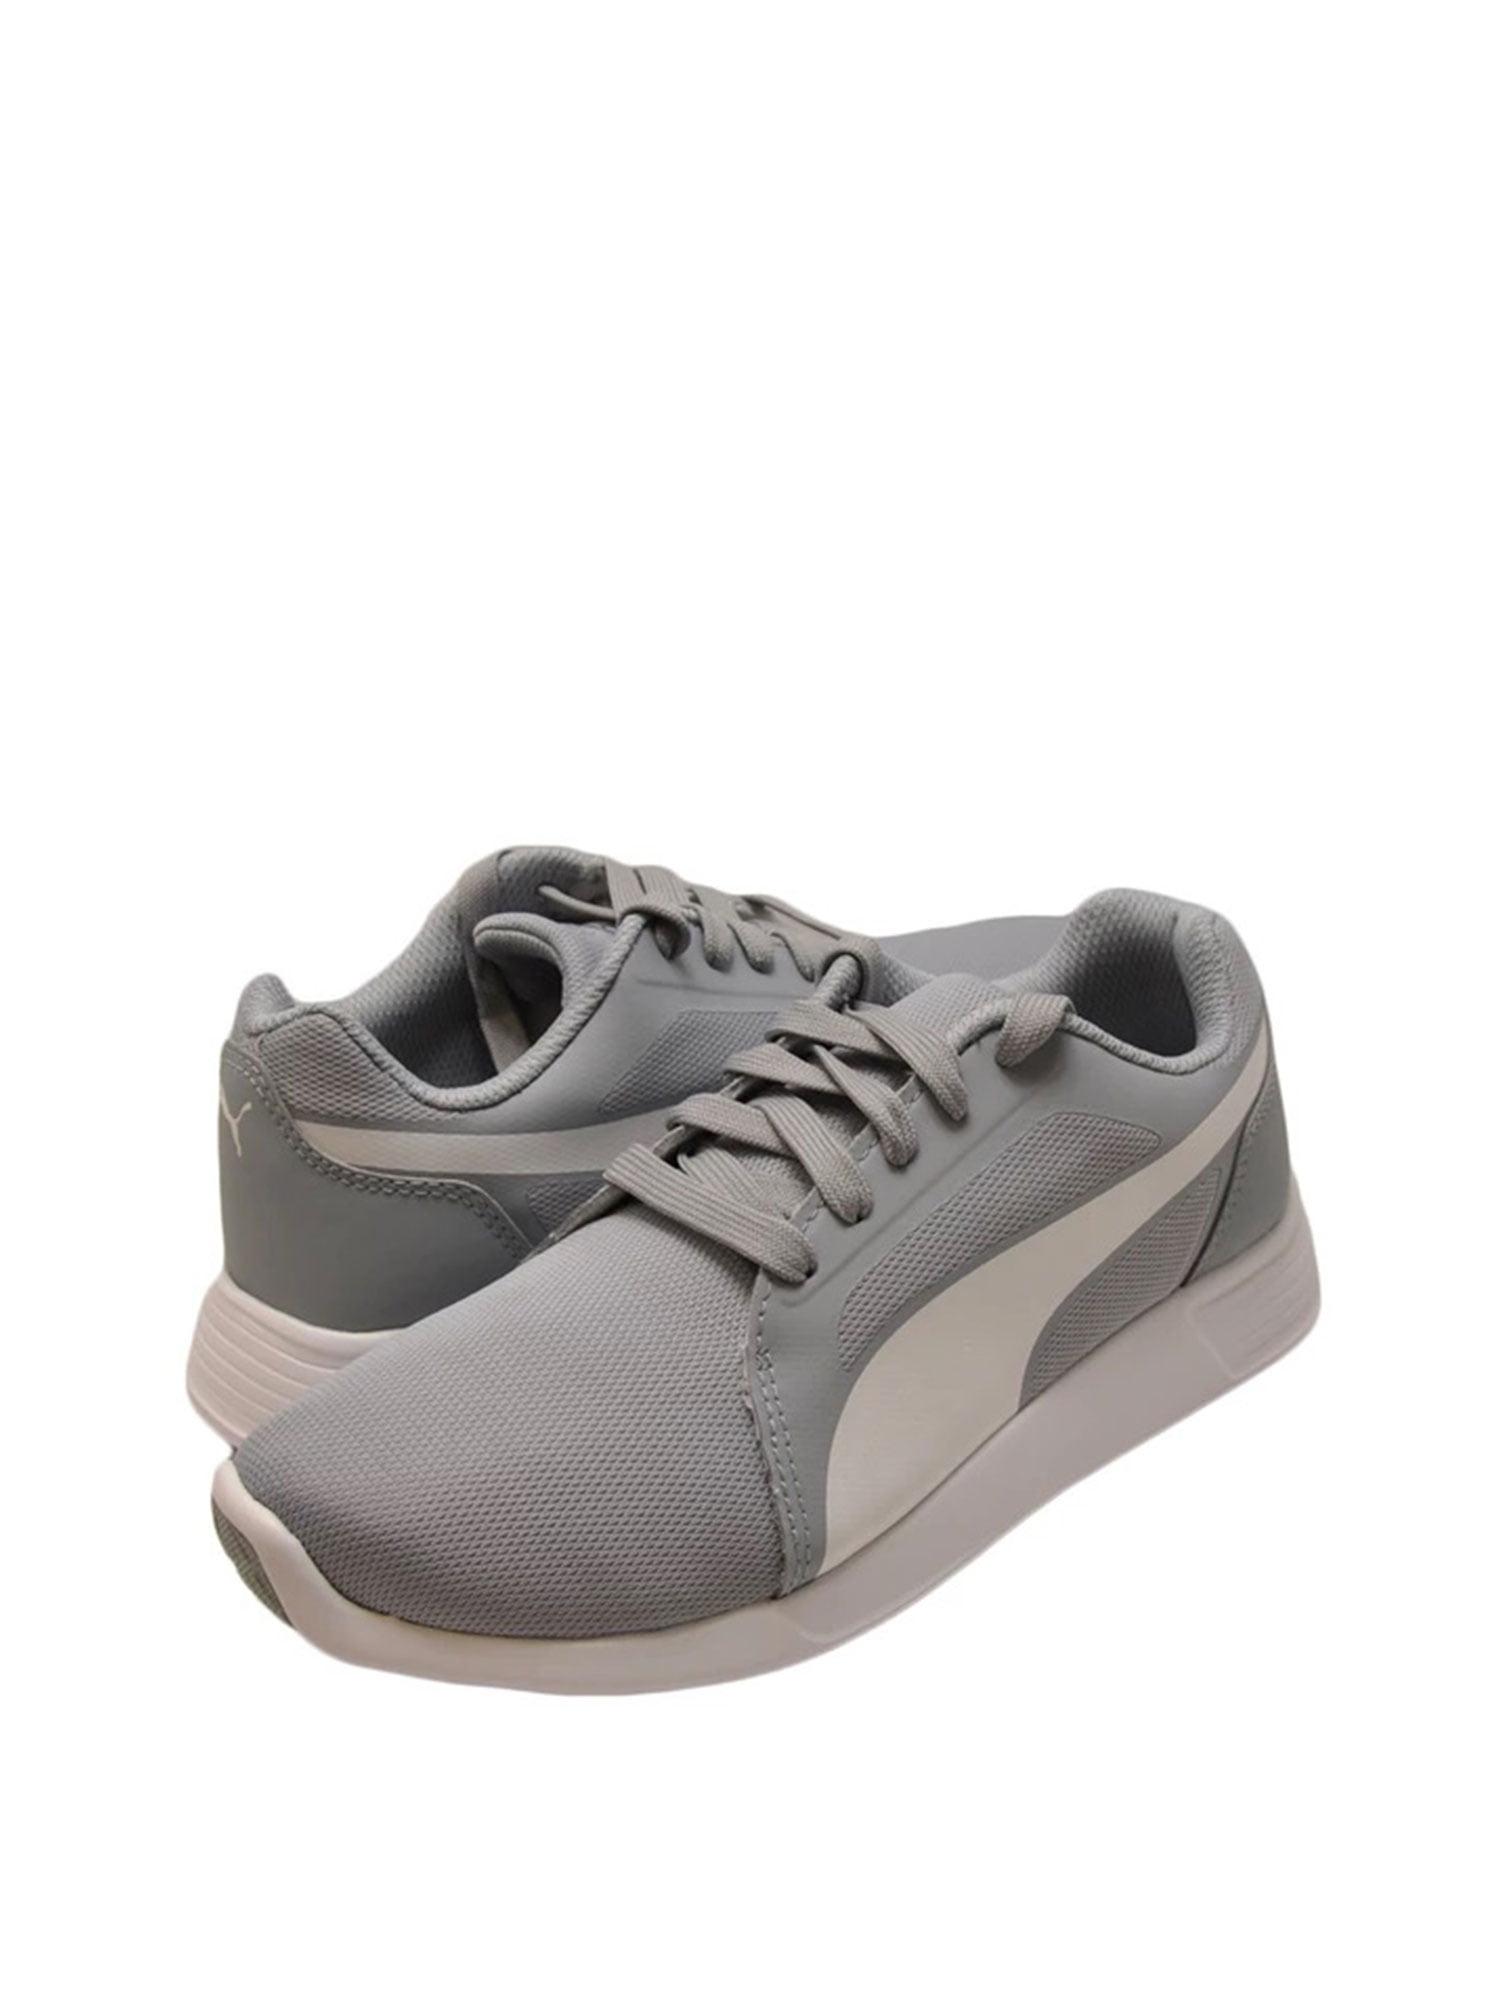 PUMA ST Trainer Evo Women's Sneakers